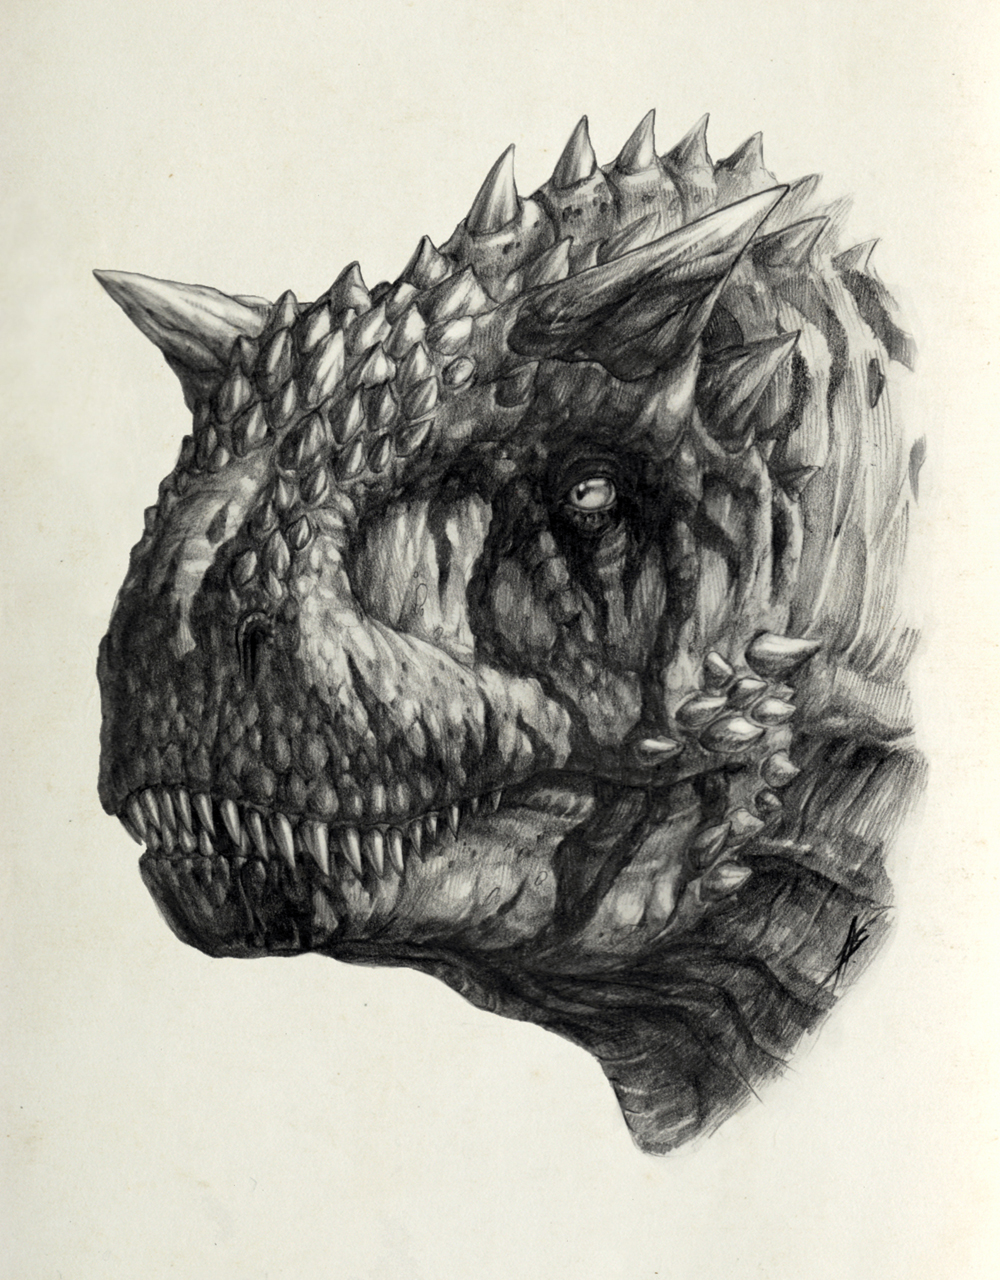 Carnotaurus III sketch by AntarcticSpring